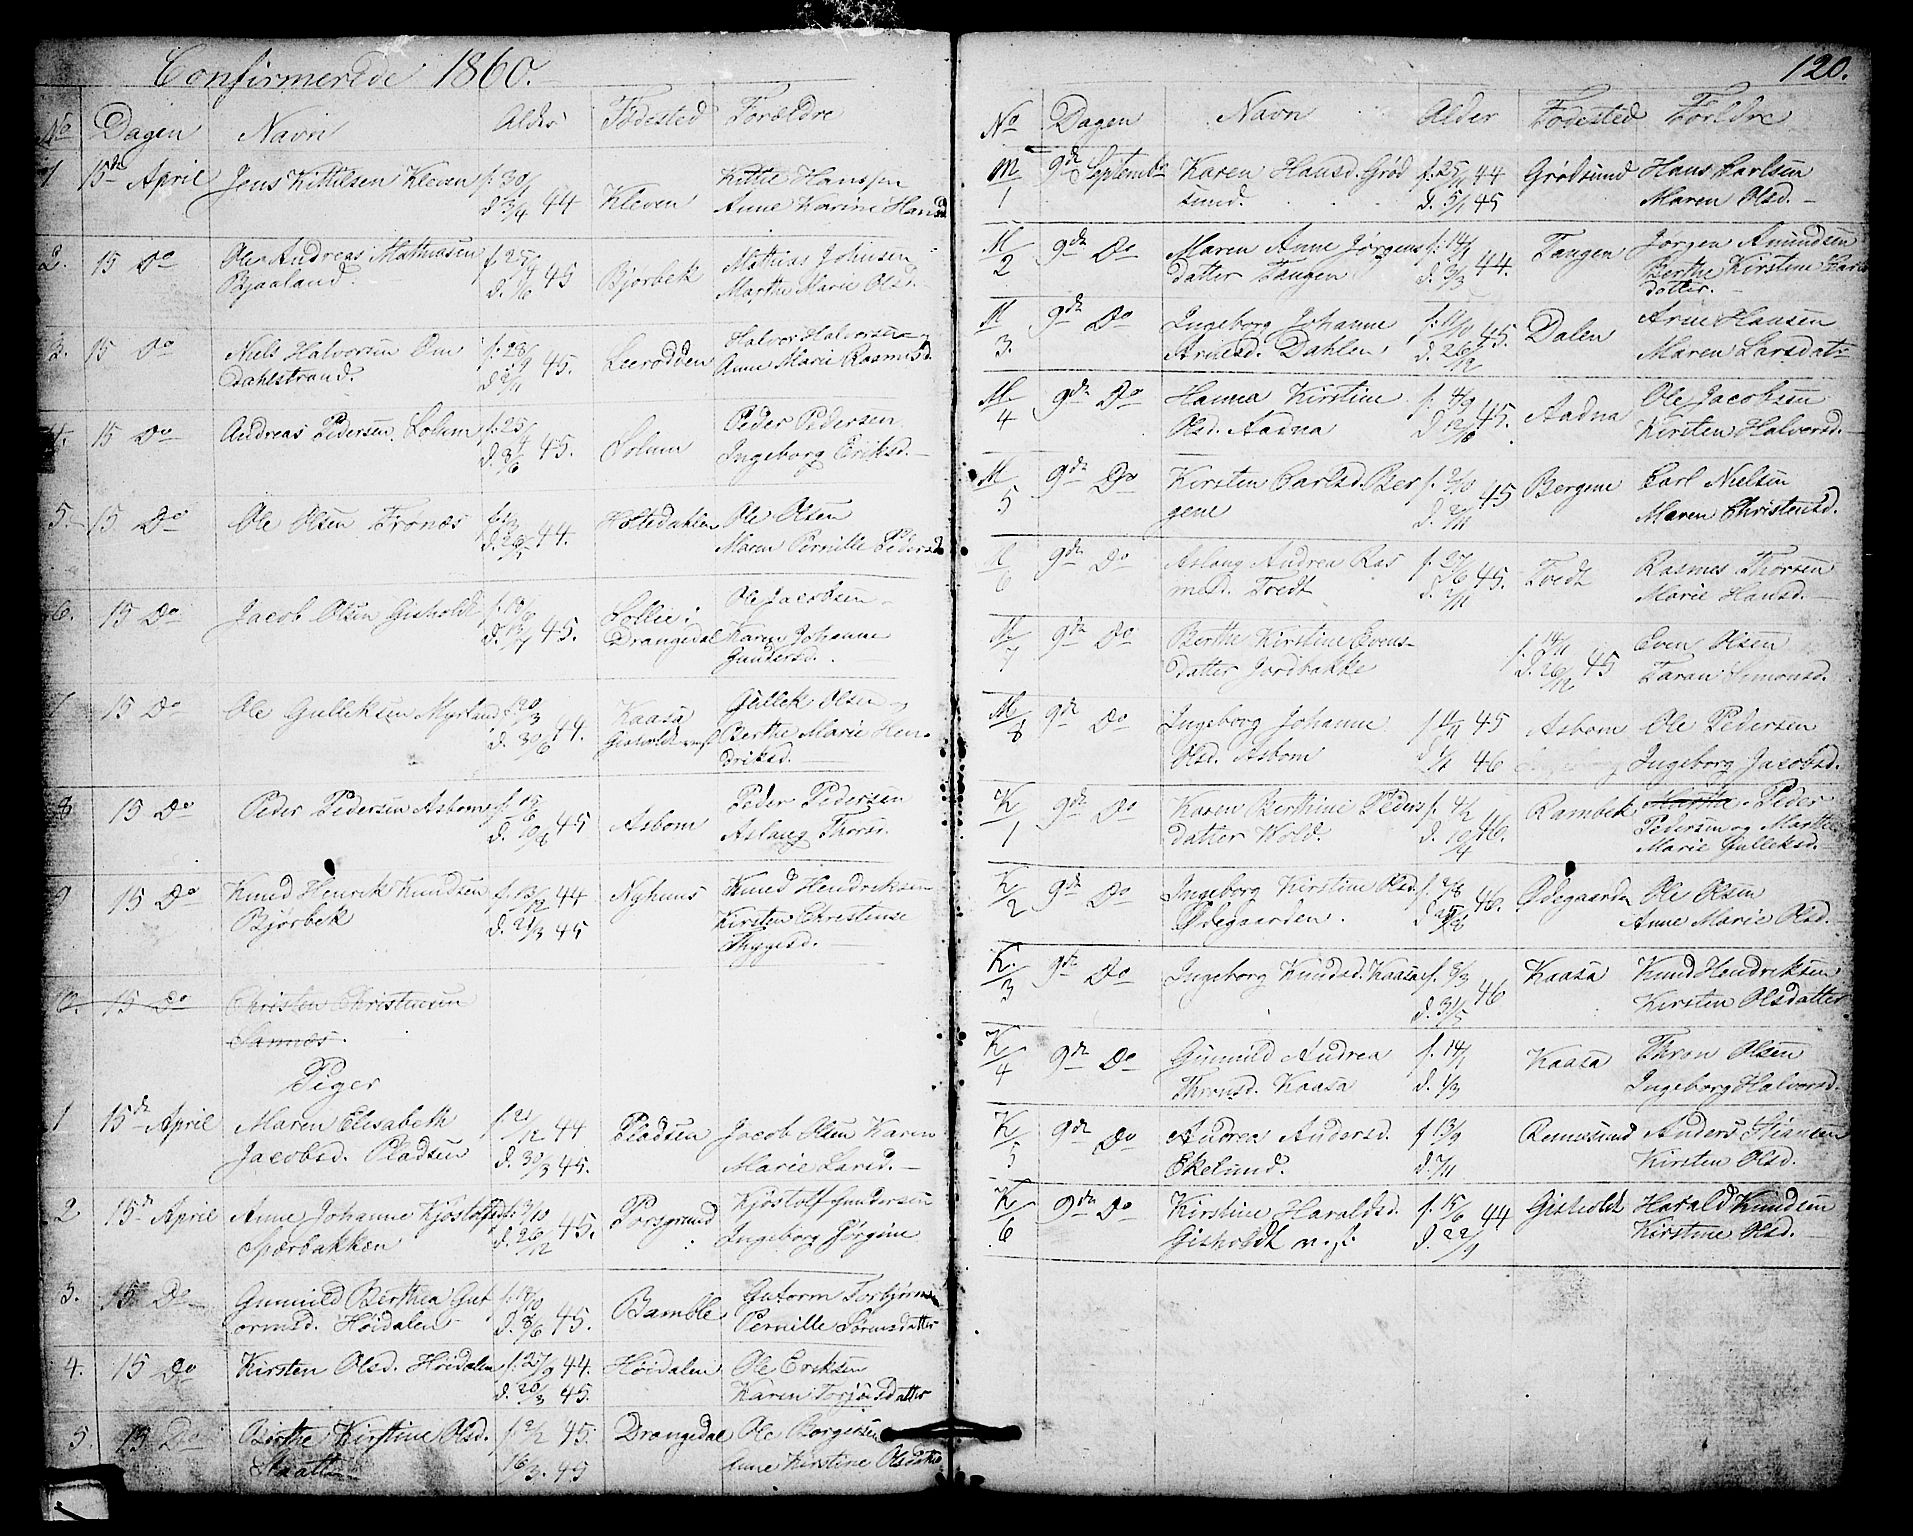 SAKO, Solum kirkebøker, G/Gb/L0002: Klokkerbok nr. II 2, 1859-1879, s. 120